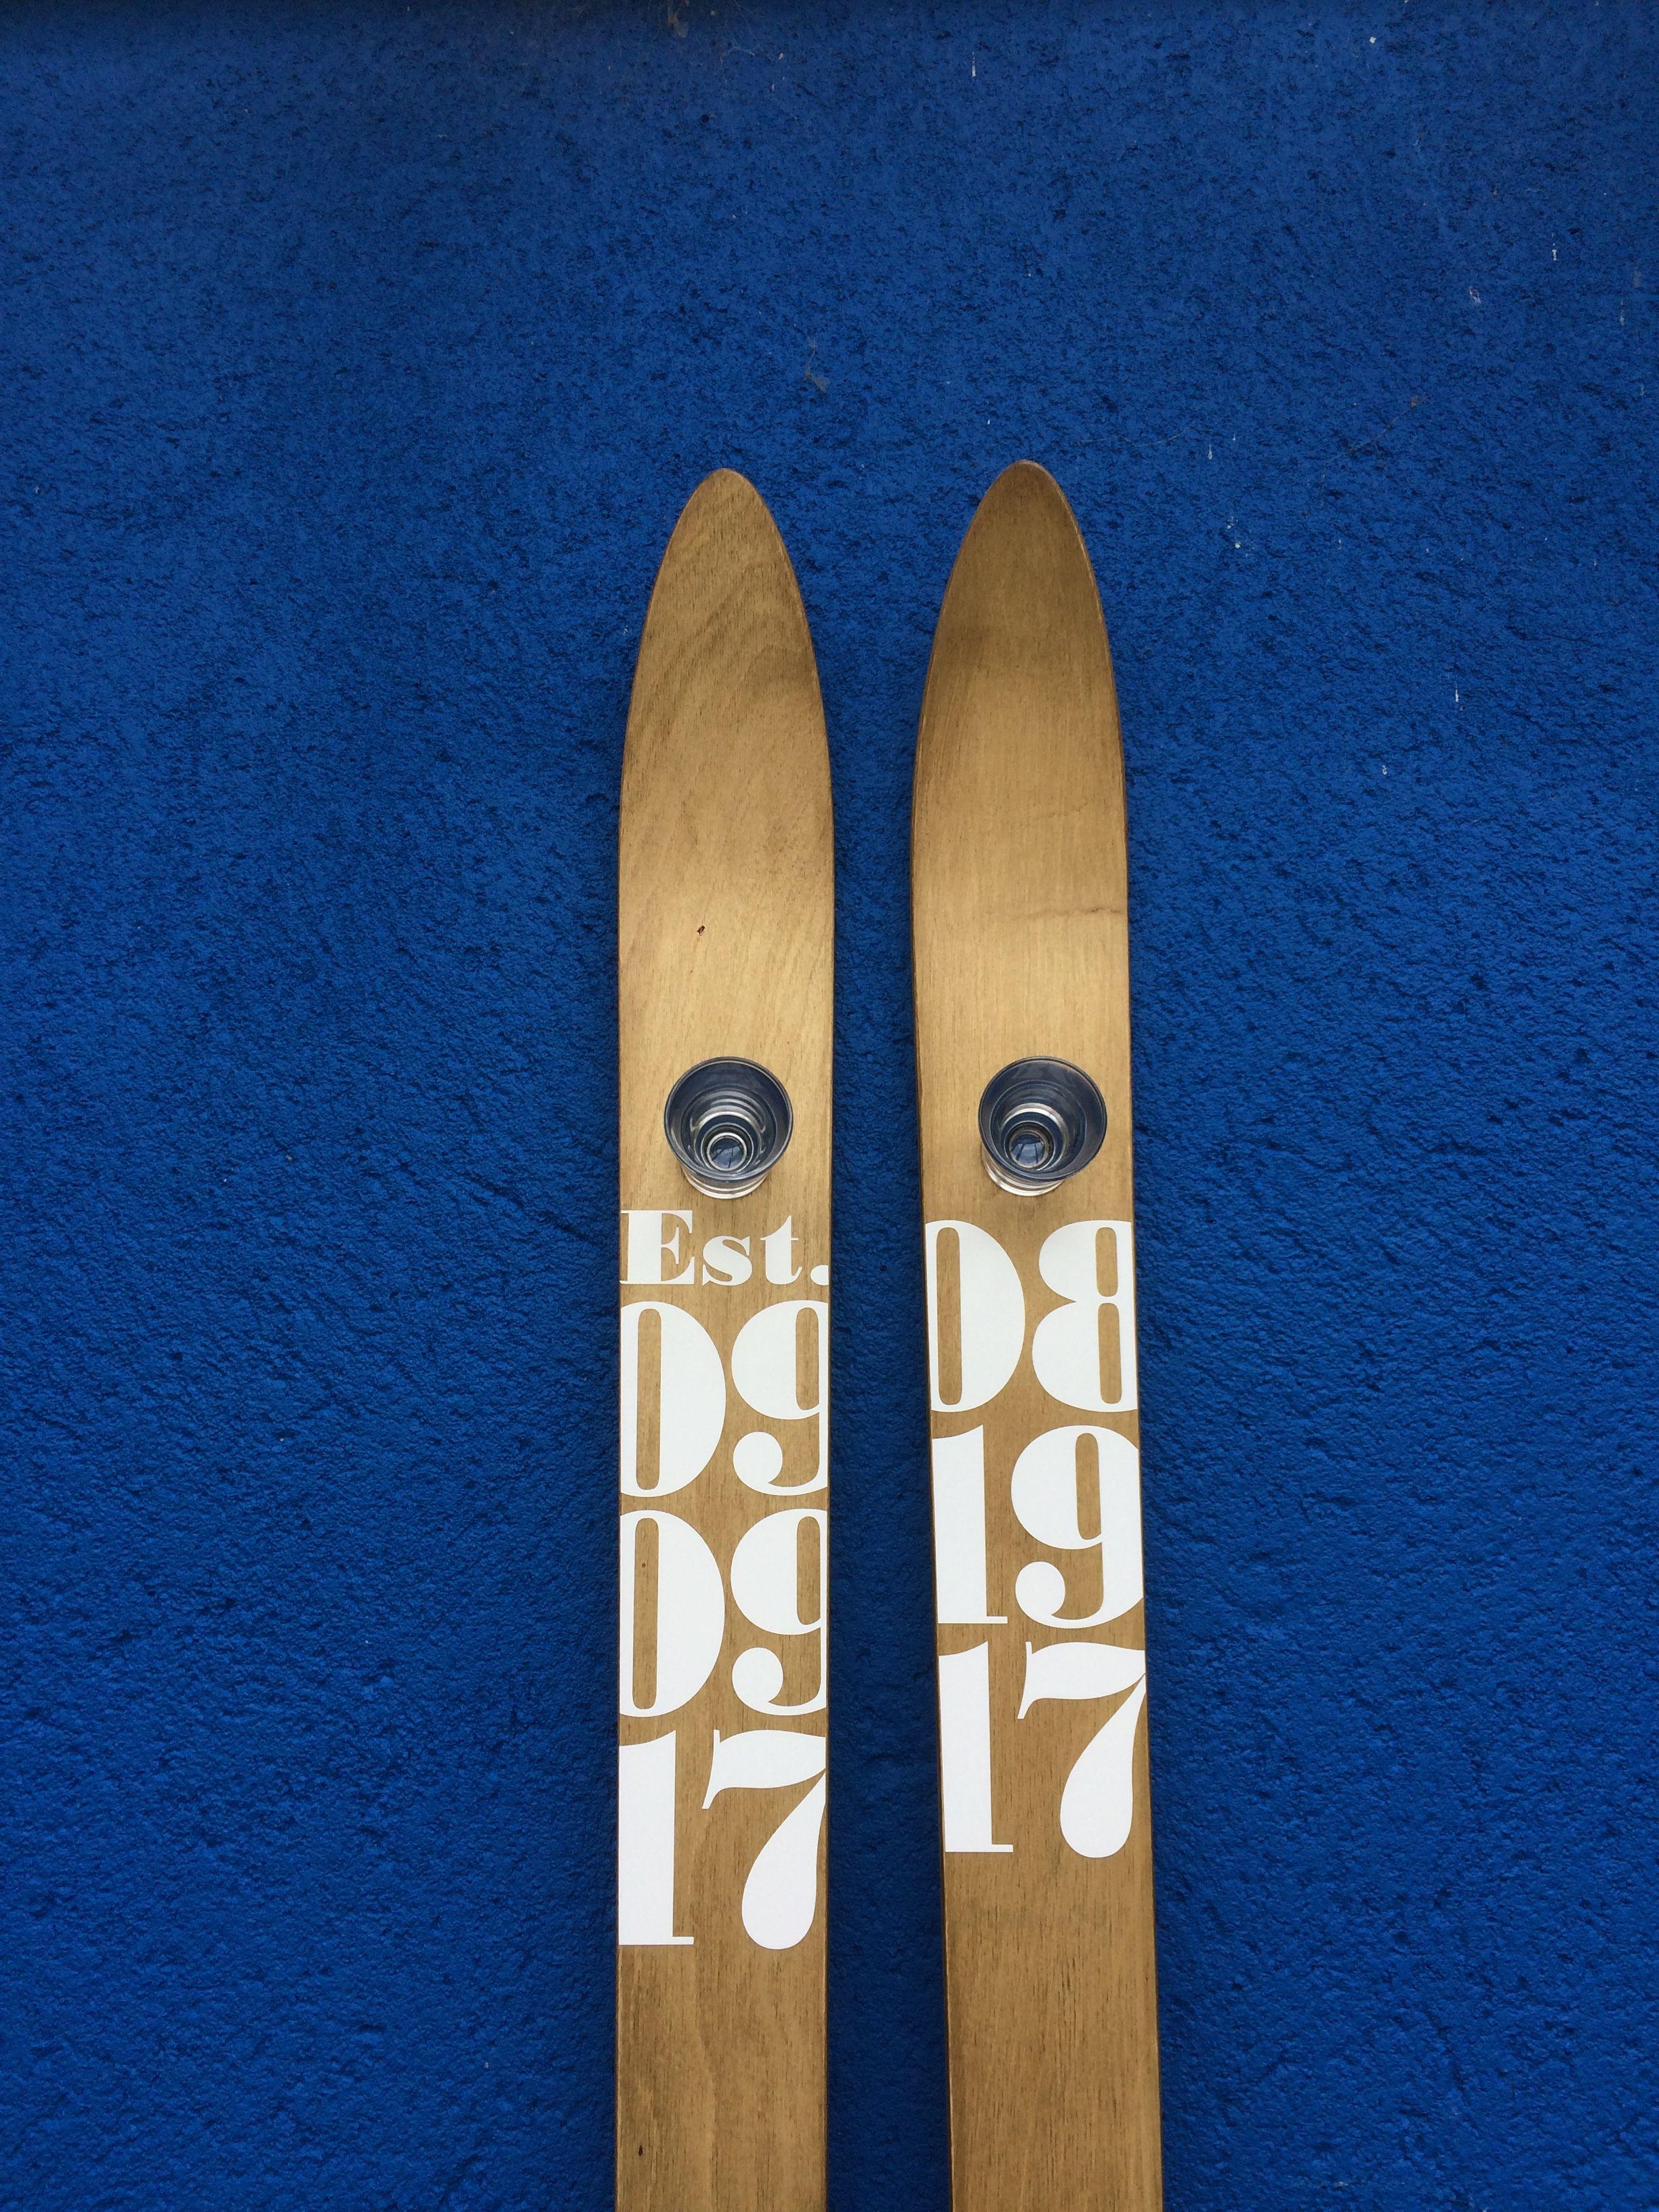 I love these dated shot skis shot ski unique items